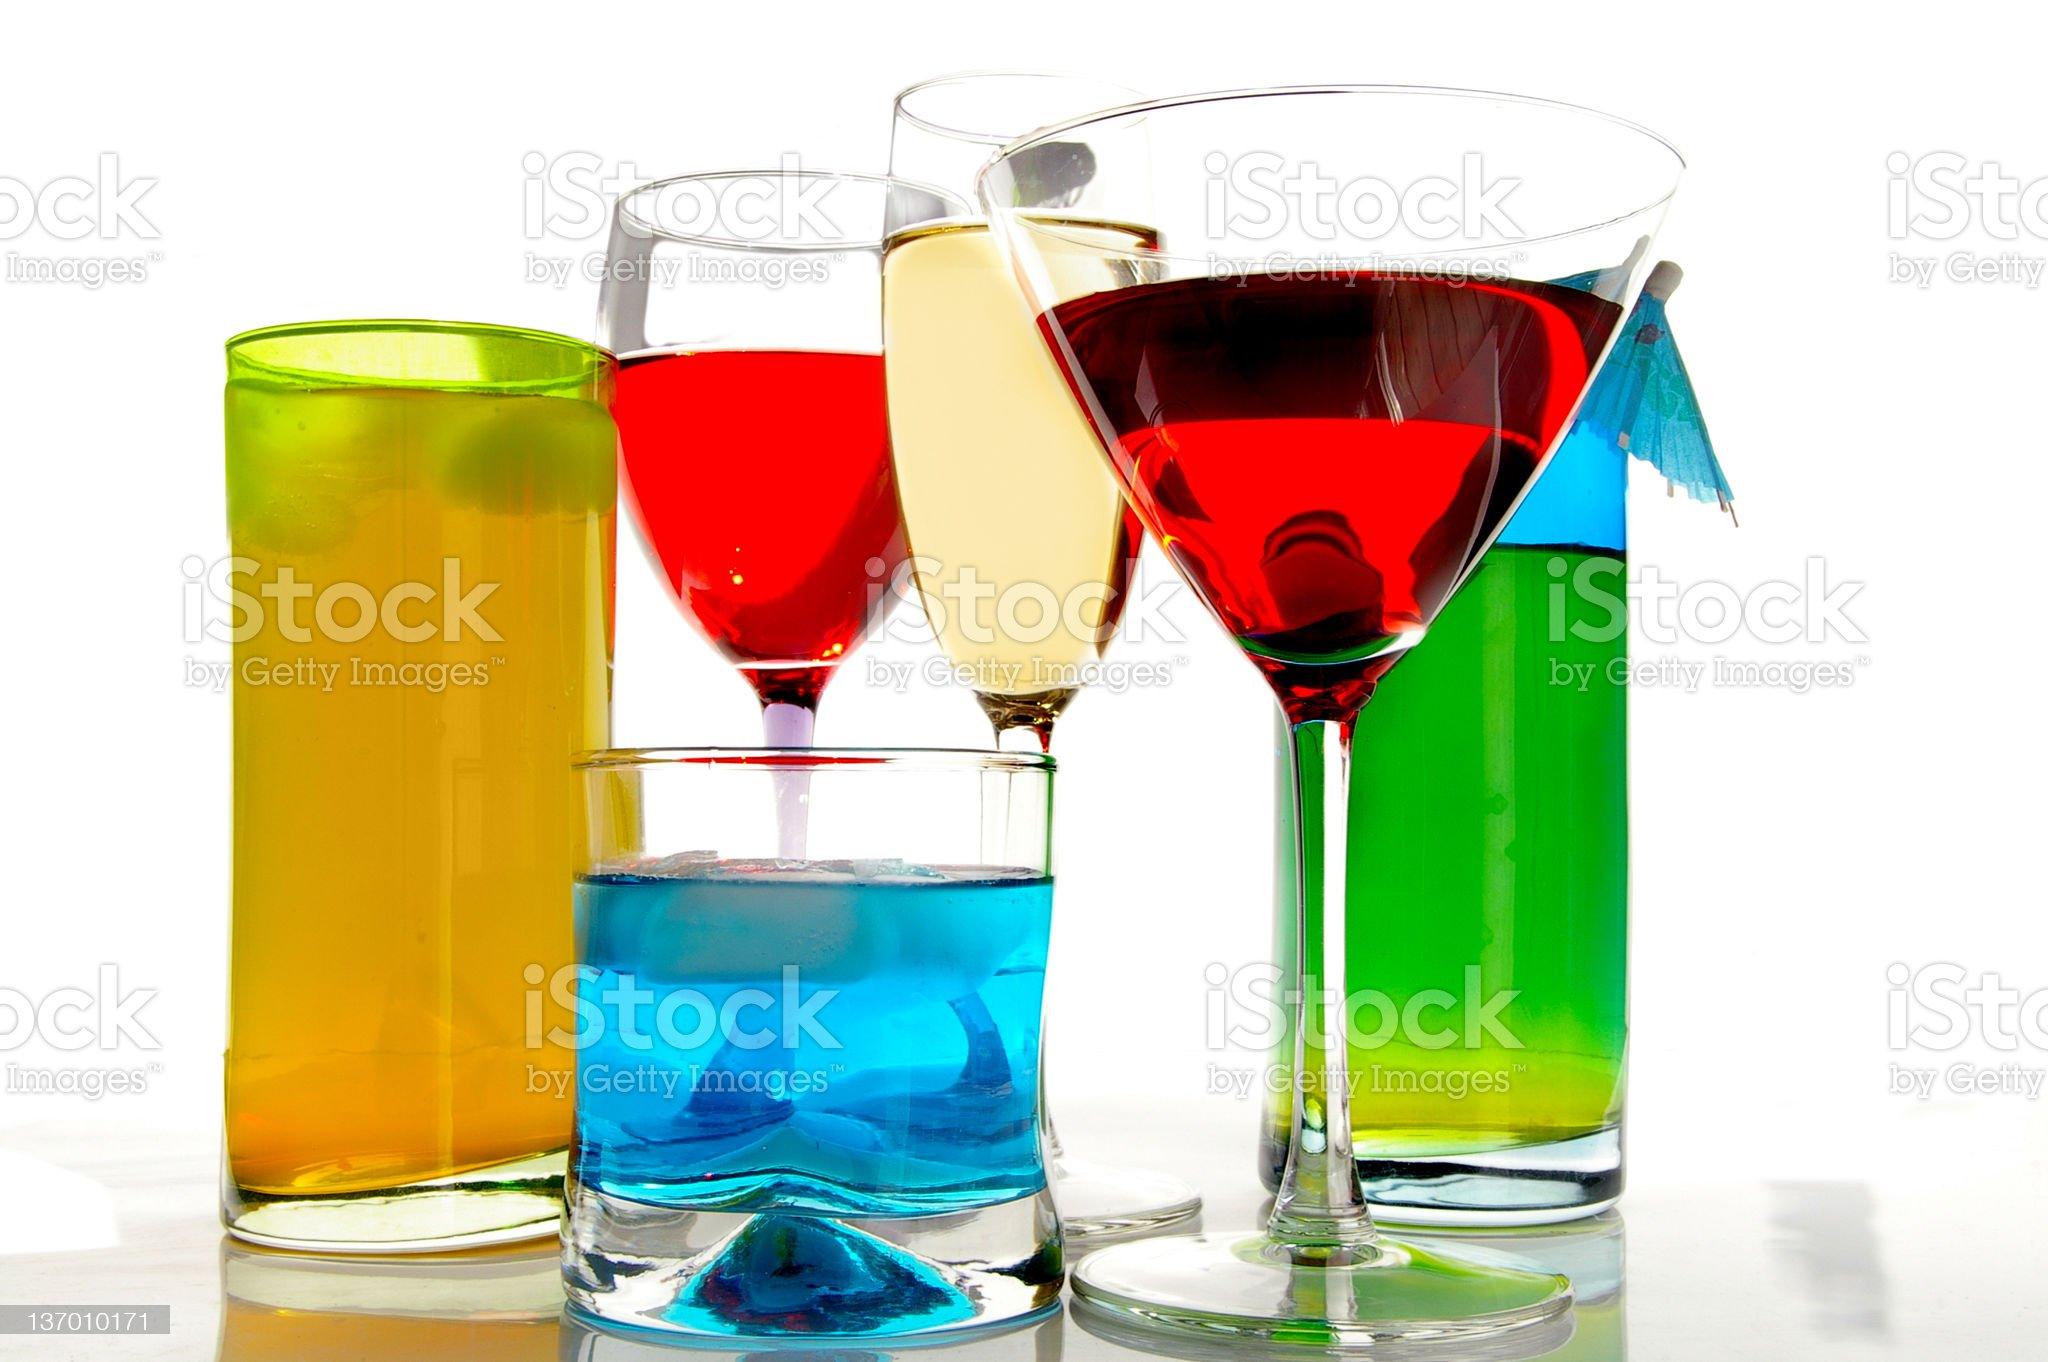 Bright drinks royalty-free stock photo